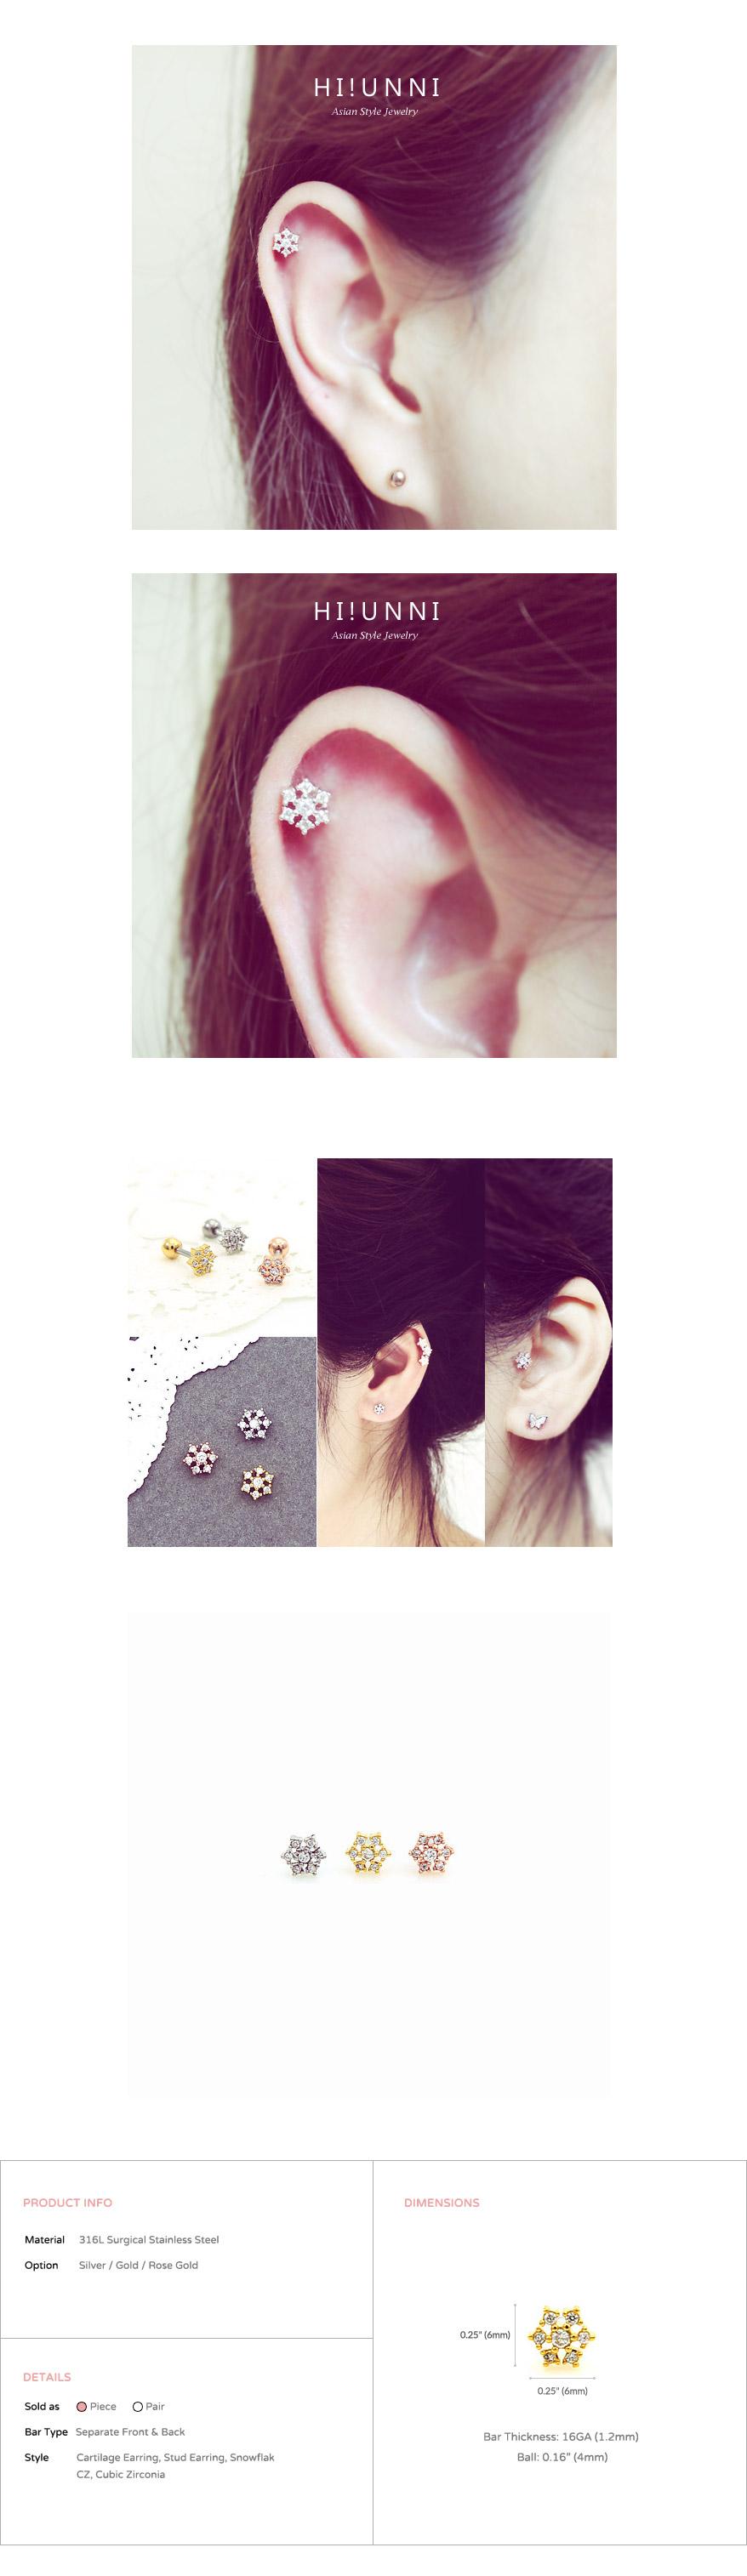 jewelry_earrings_stud_cartilage_piercing_16g_barbell_316l_cz_conch_helix_triple_star_flower_starflake_snow_snowflake_4